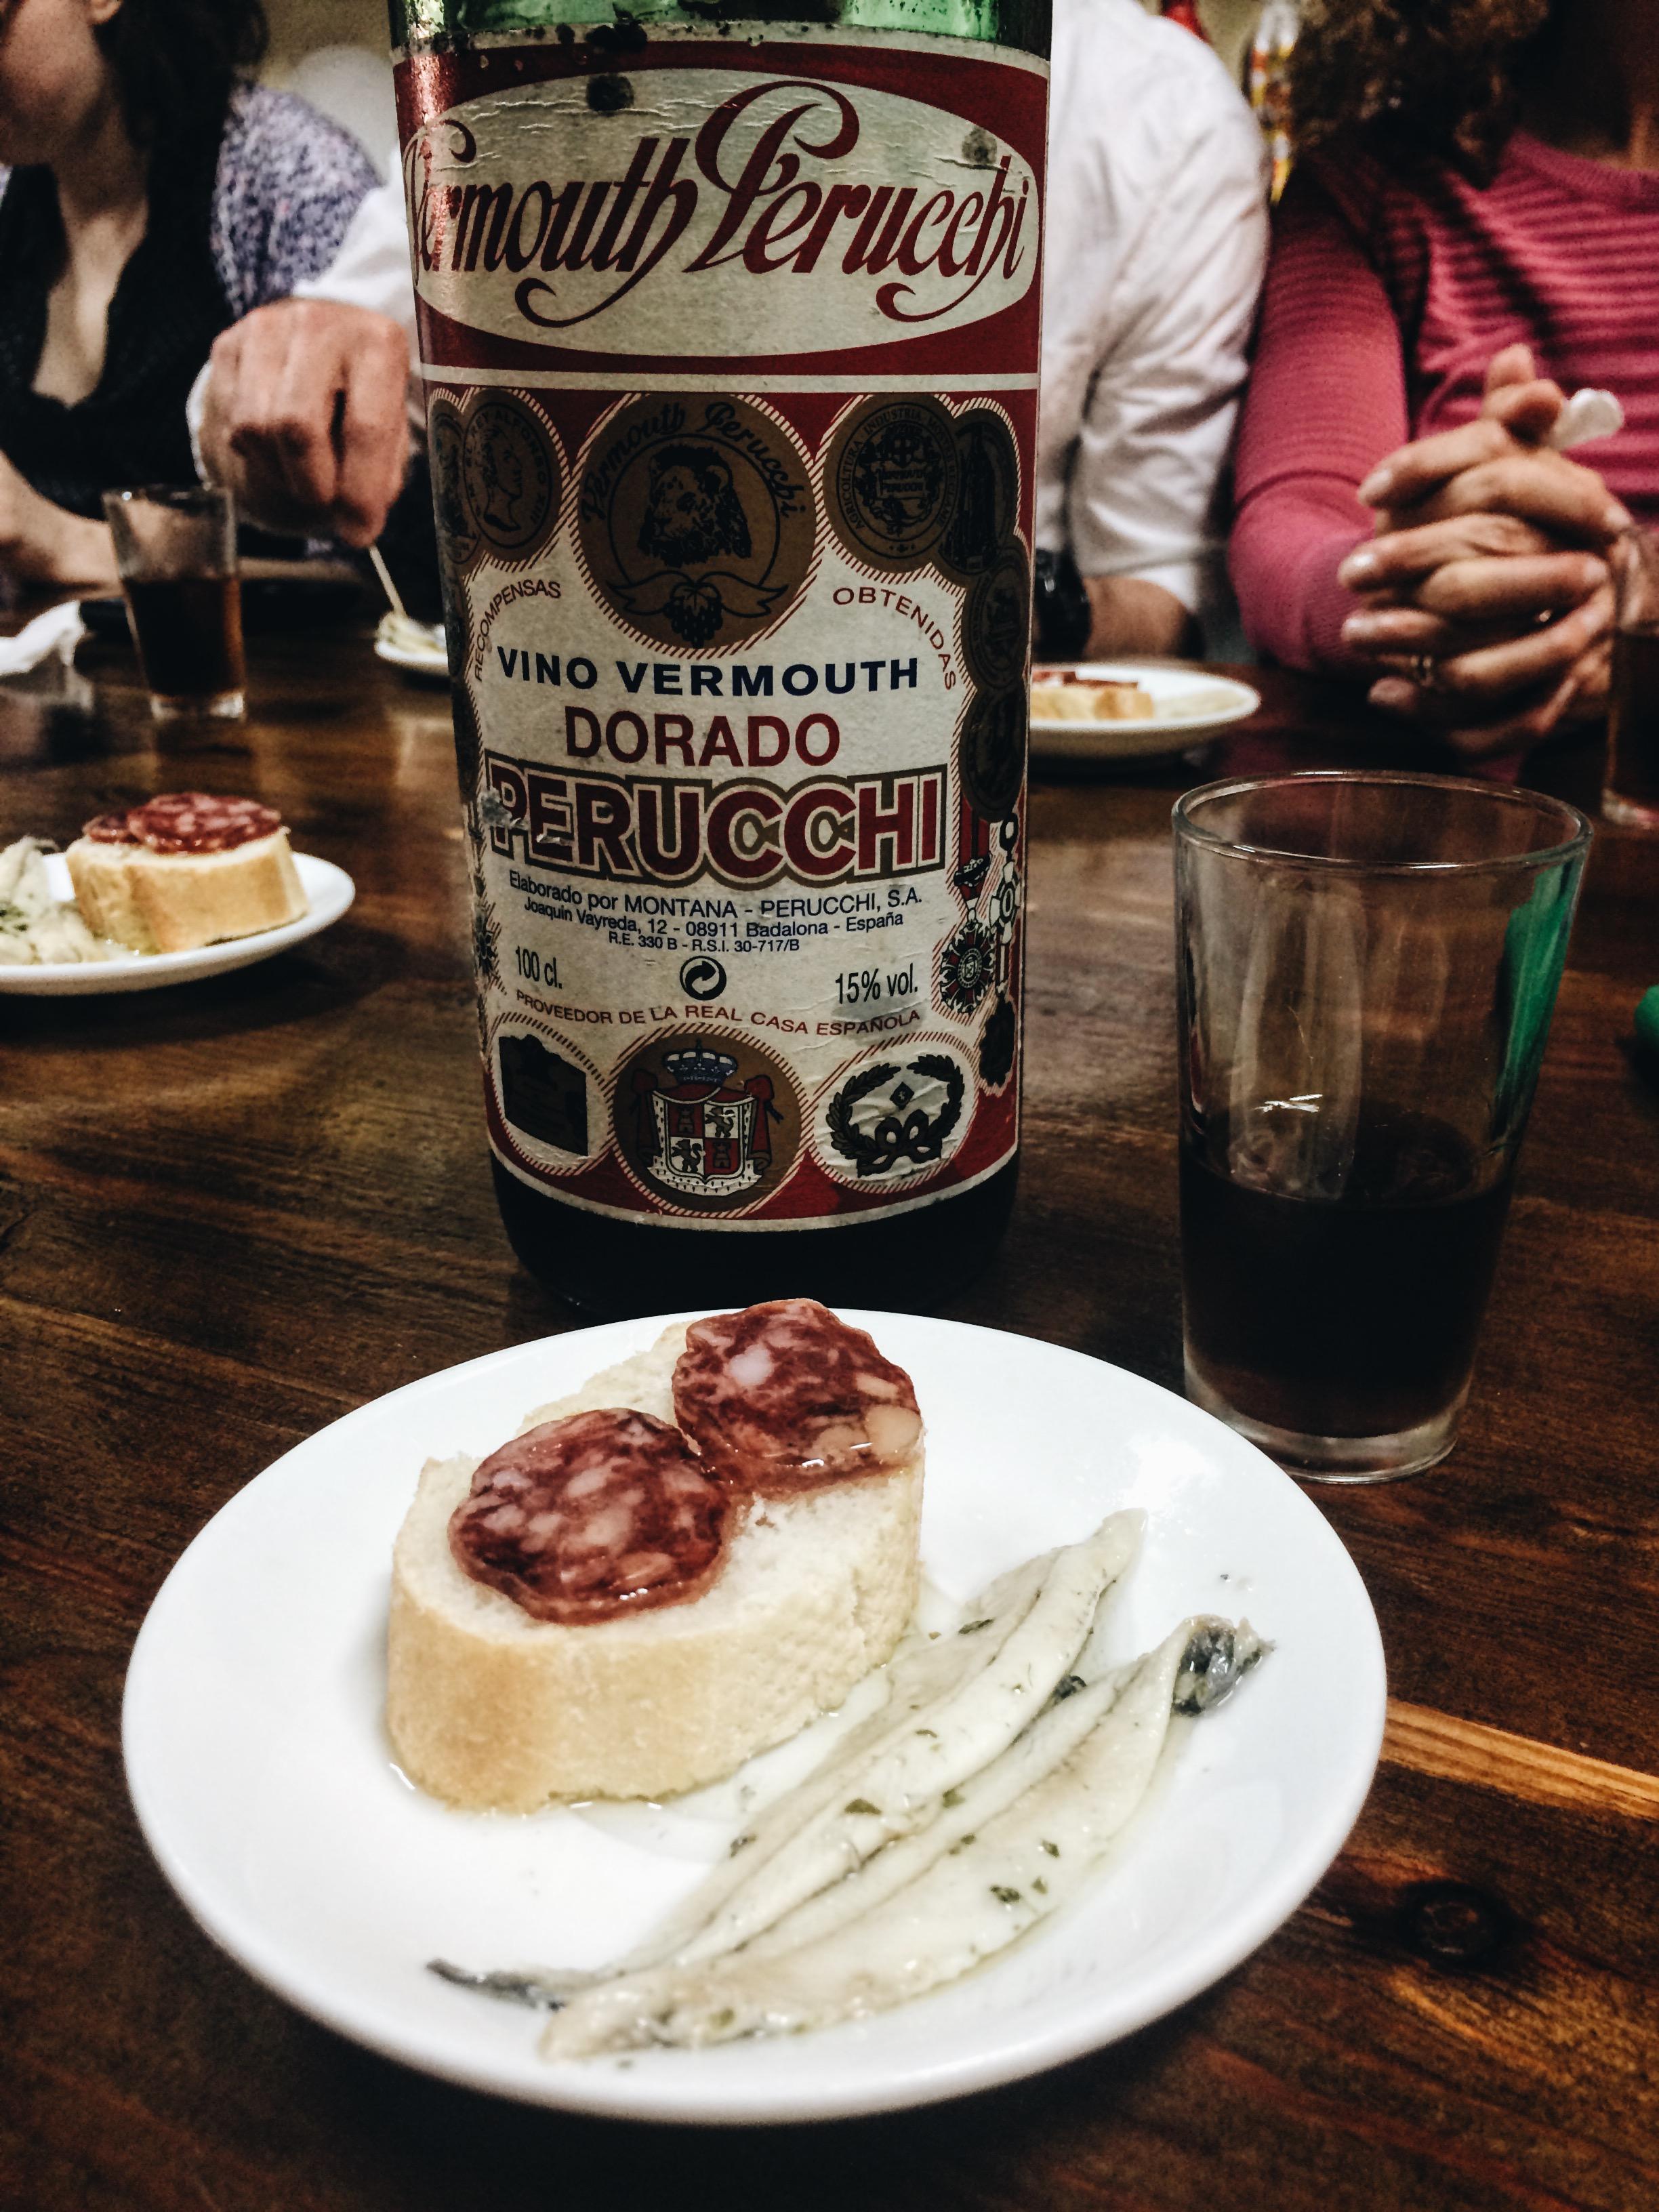 Vermouth at Cal Pep, Gracia, Barcelona